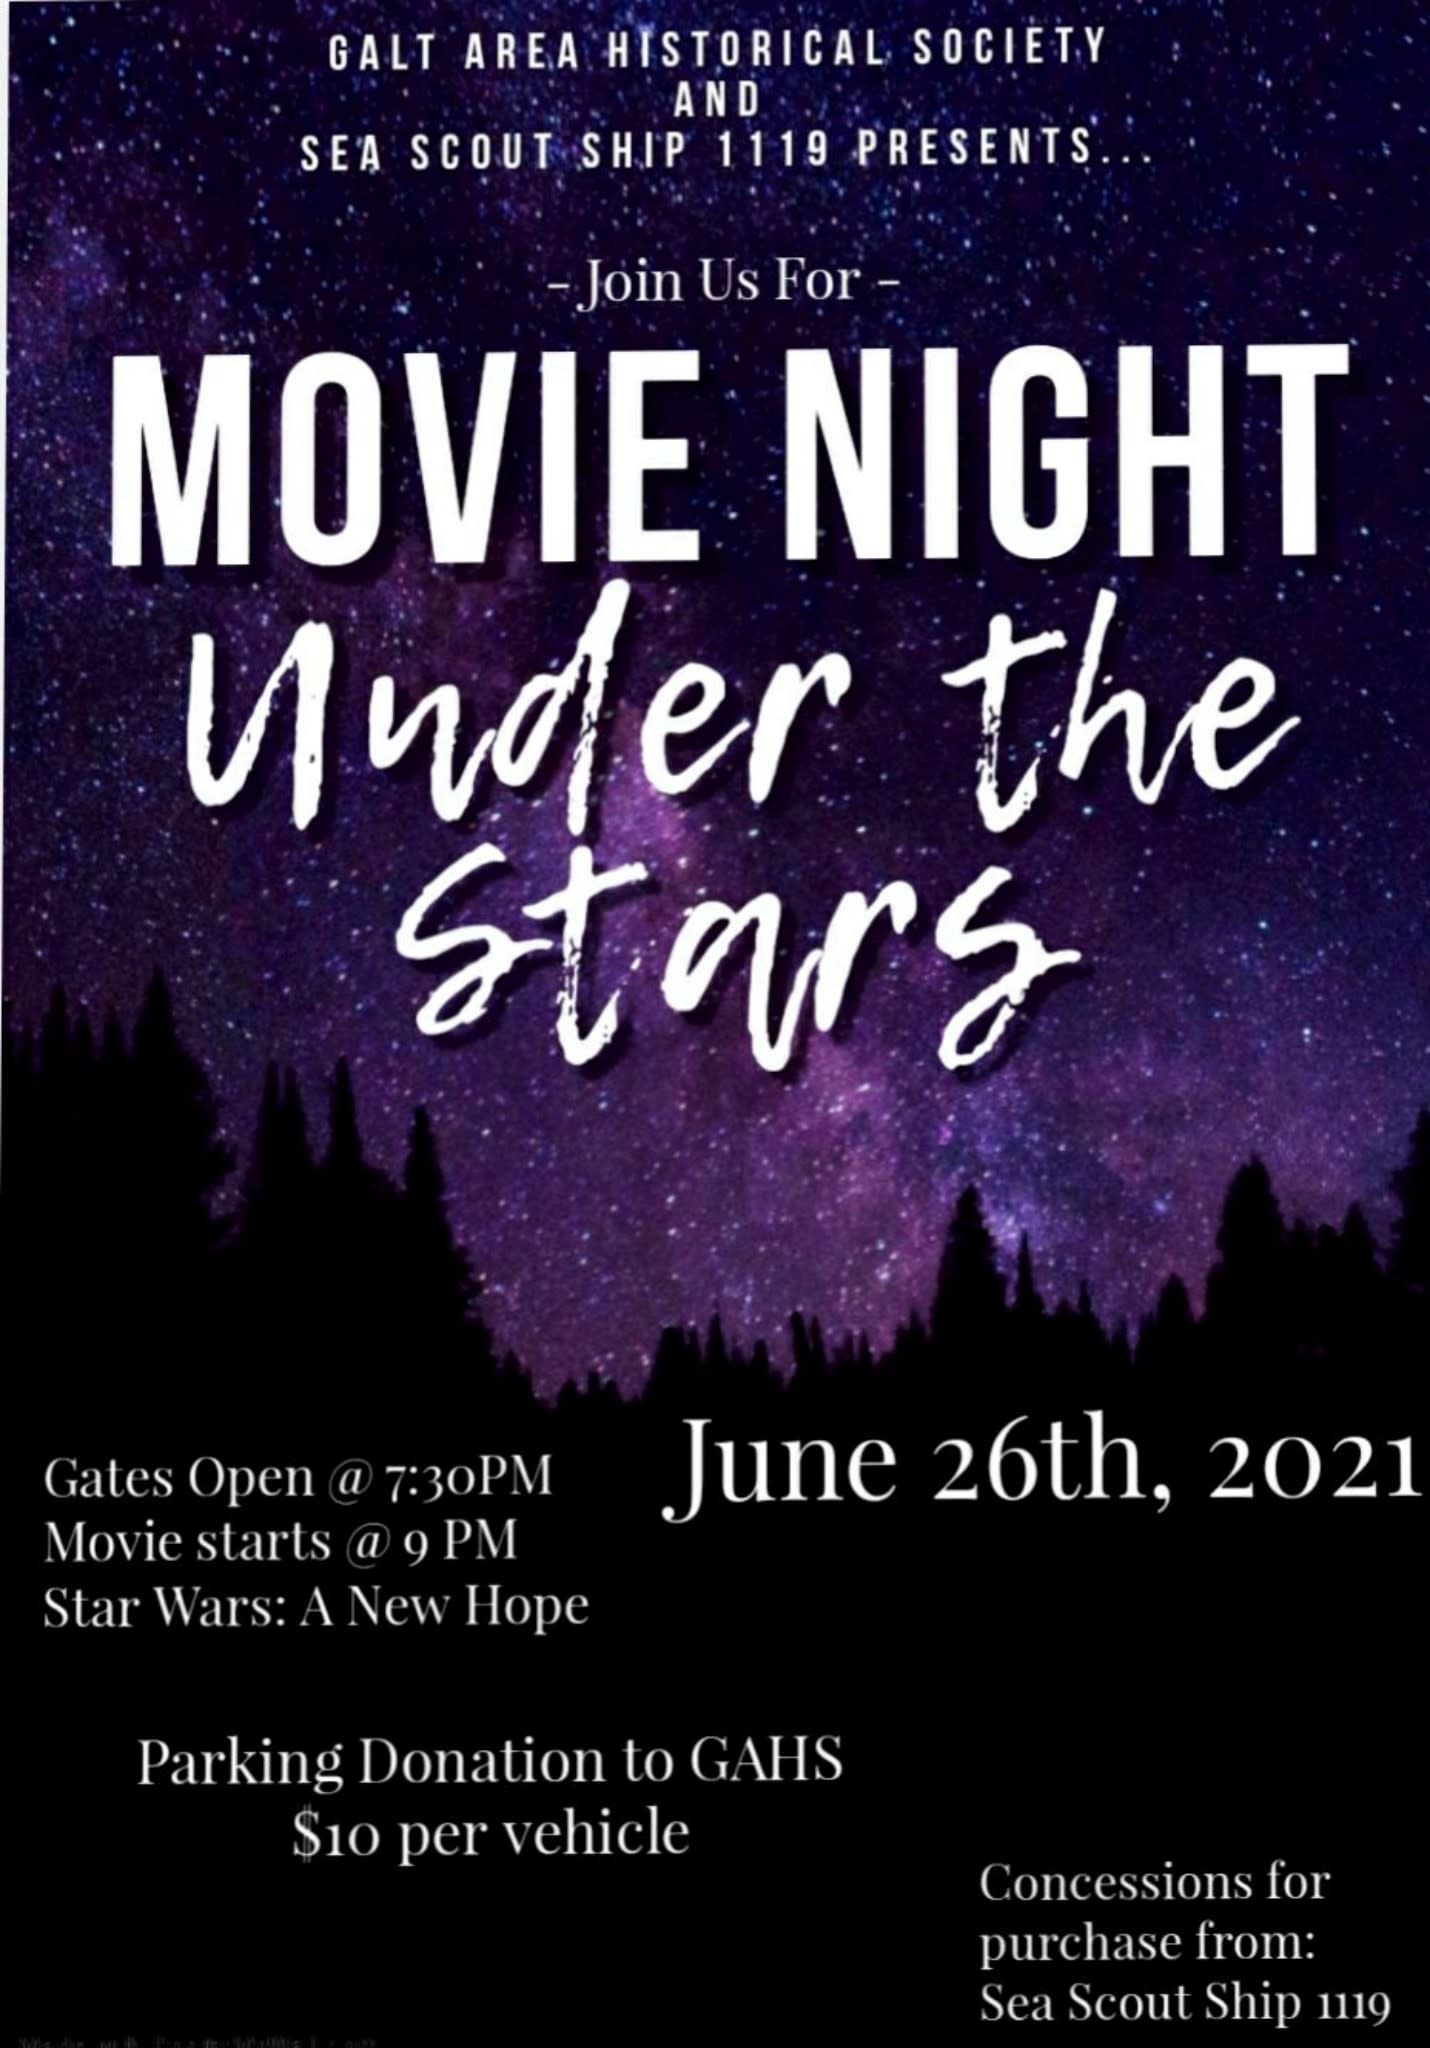 Movie Night Under the Stars flyer - June 26, 2021